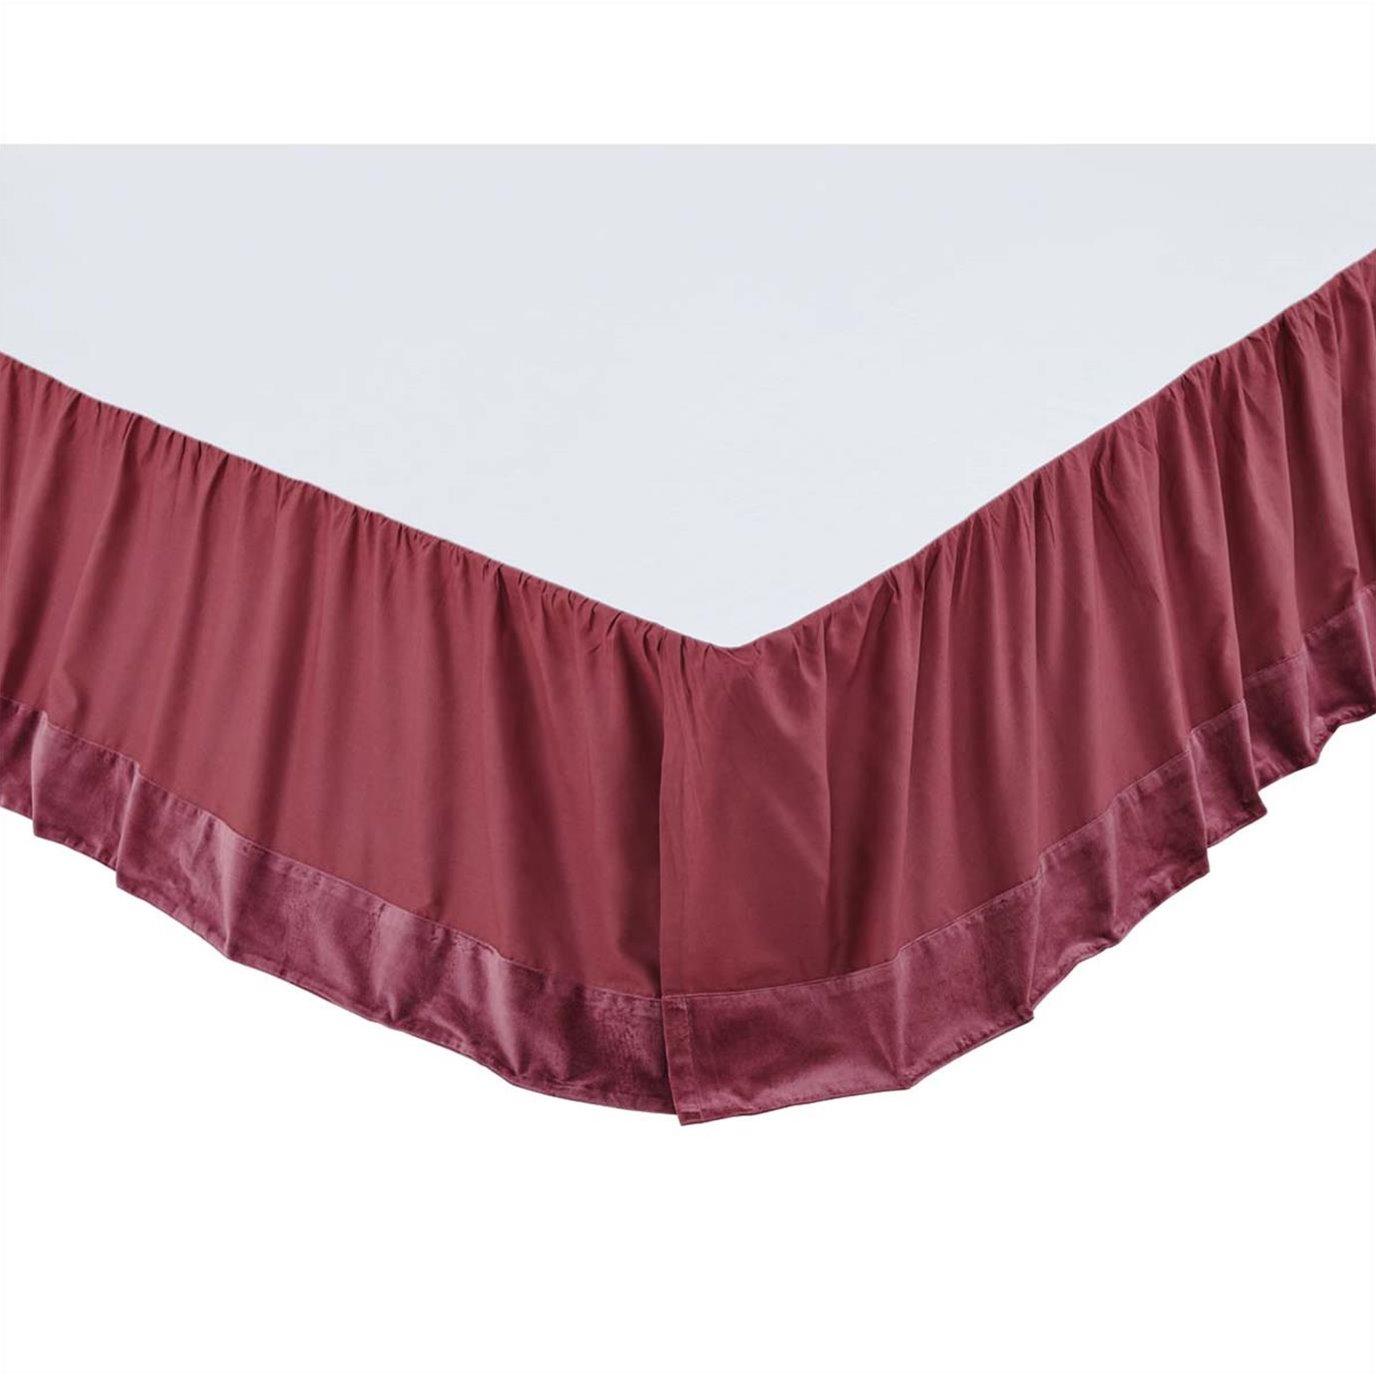 Eleanor Mauve King Bed Skirt 78x80x16